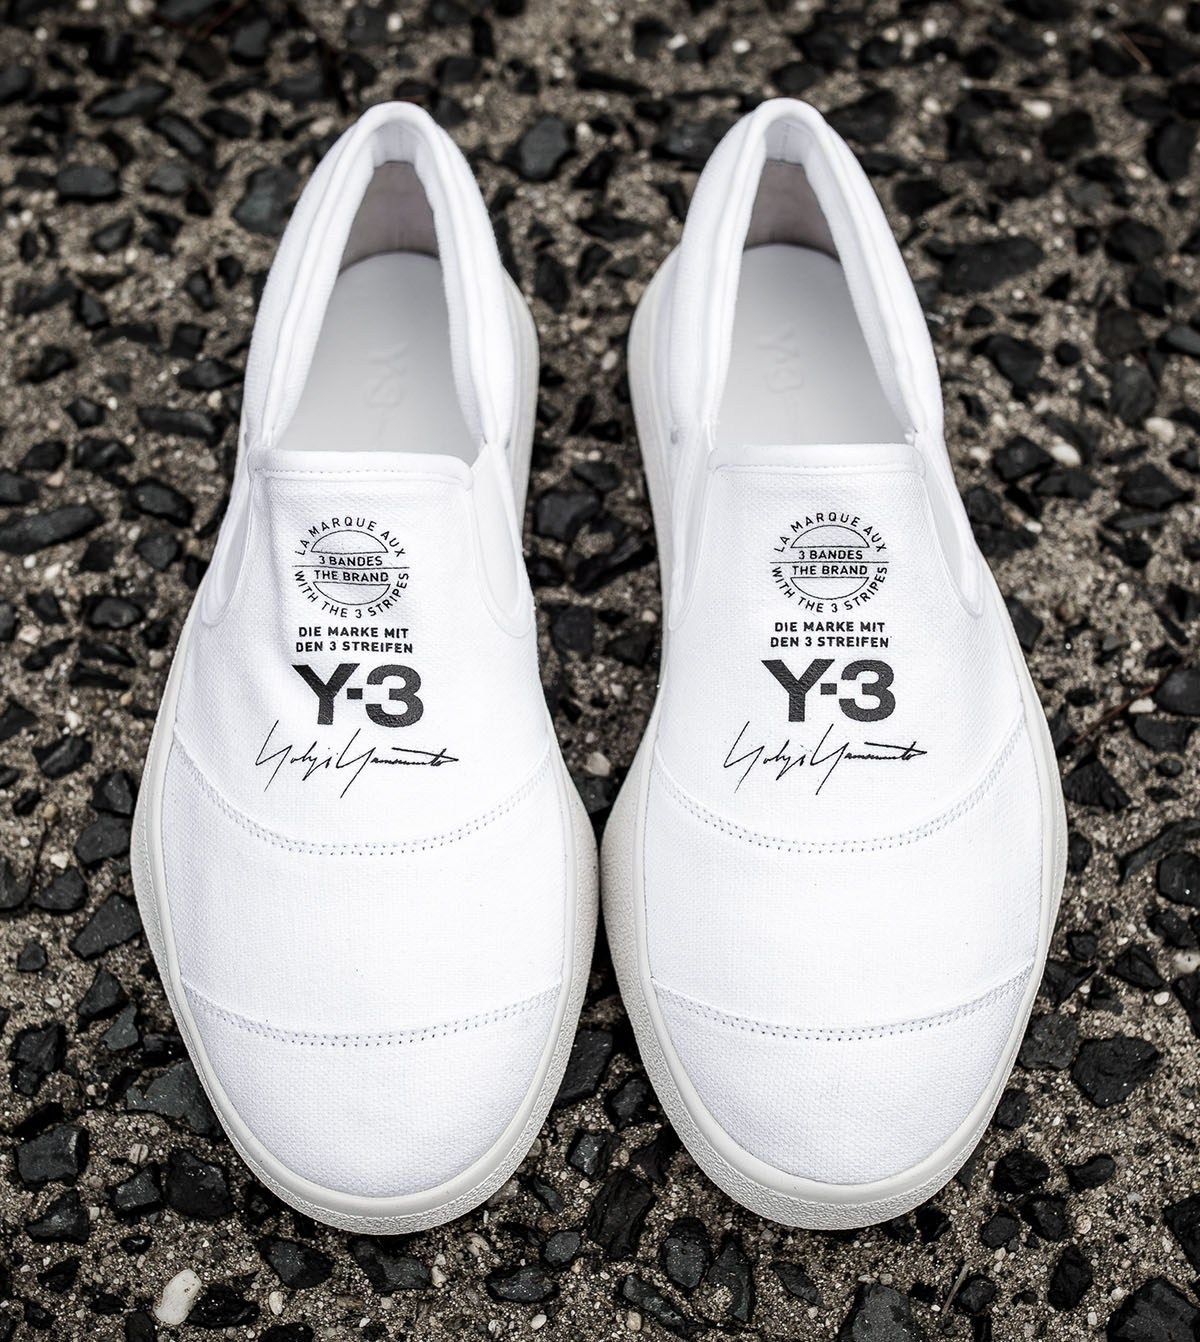 4861984e467 adidas Y-3 Tangutsu in White - EU Kicks  Sneaker Magazine   Street ...